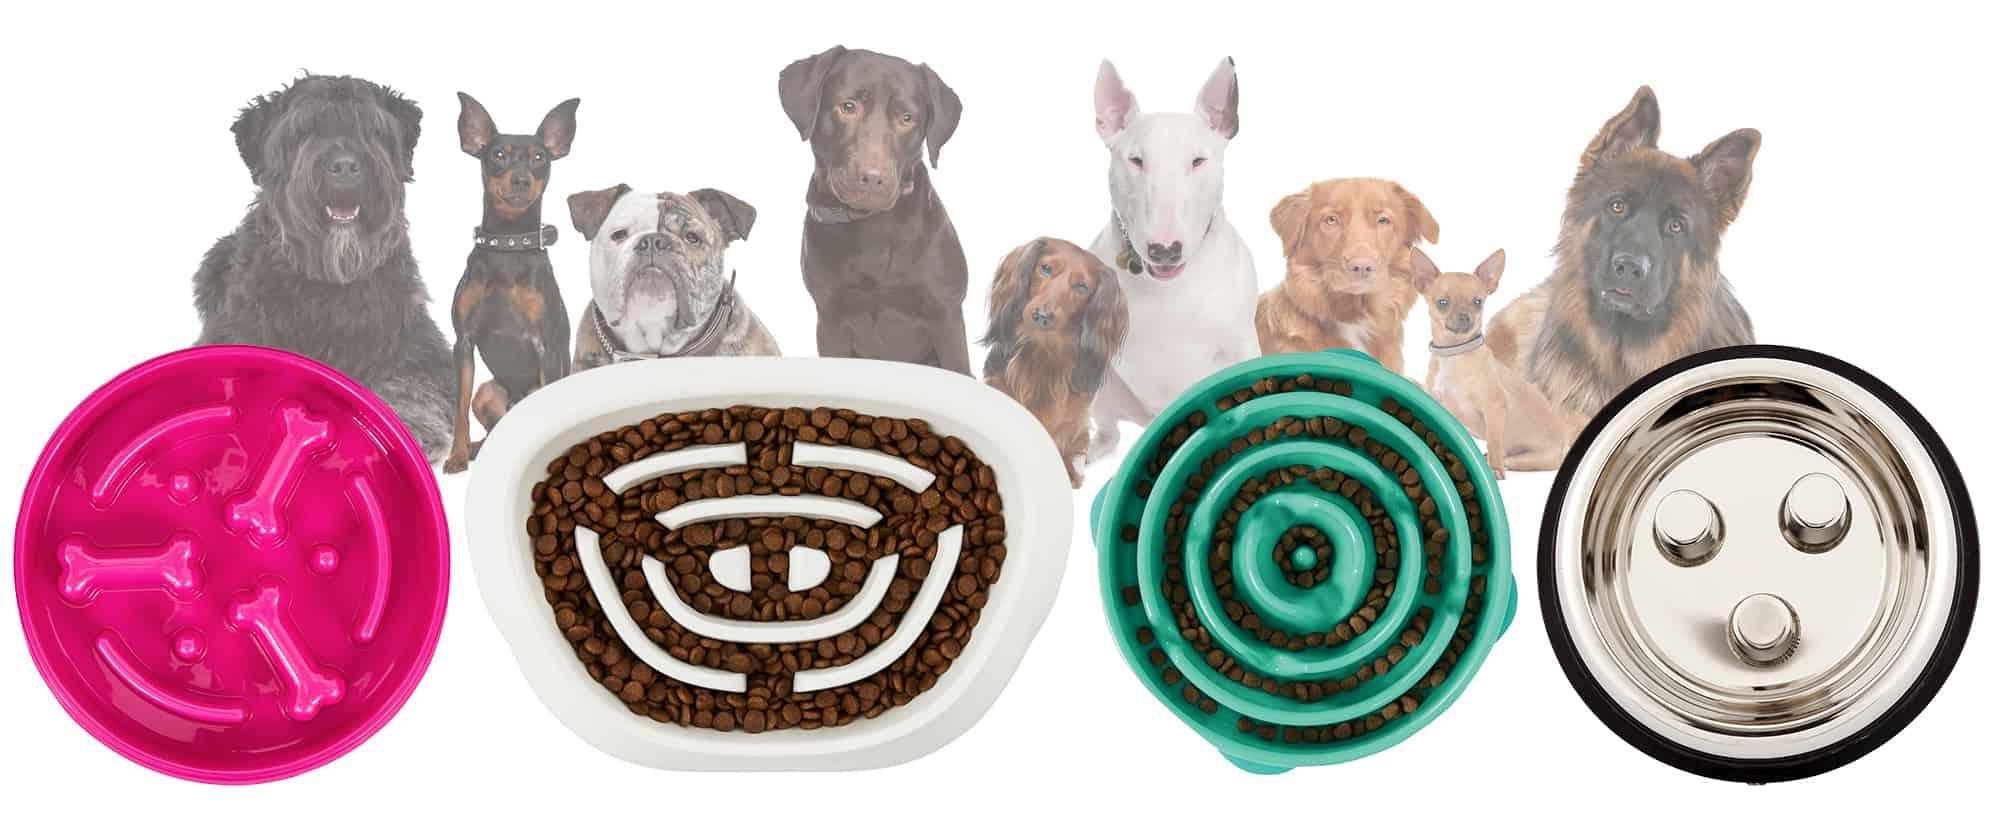 Slow Eating Dog Bowls